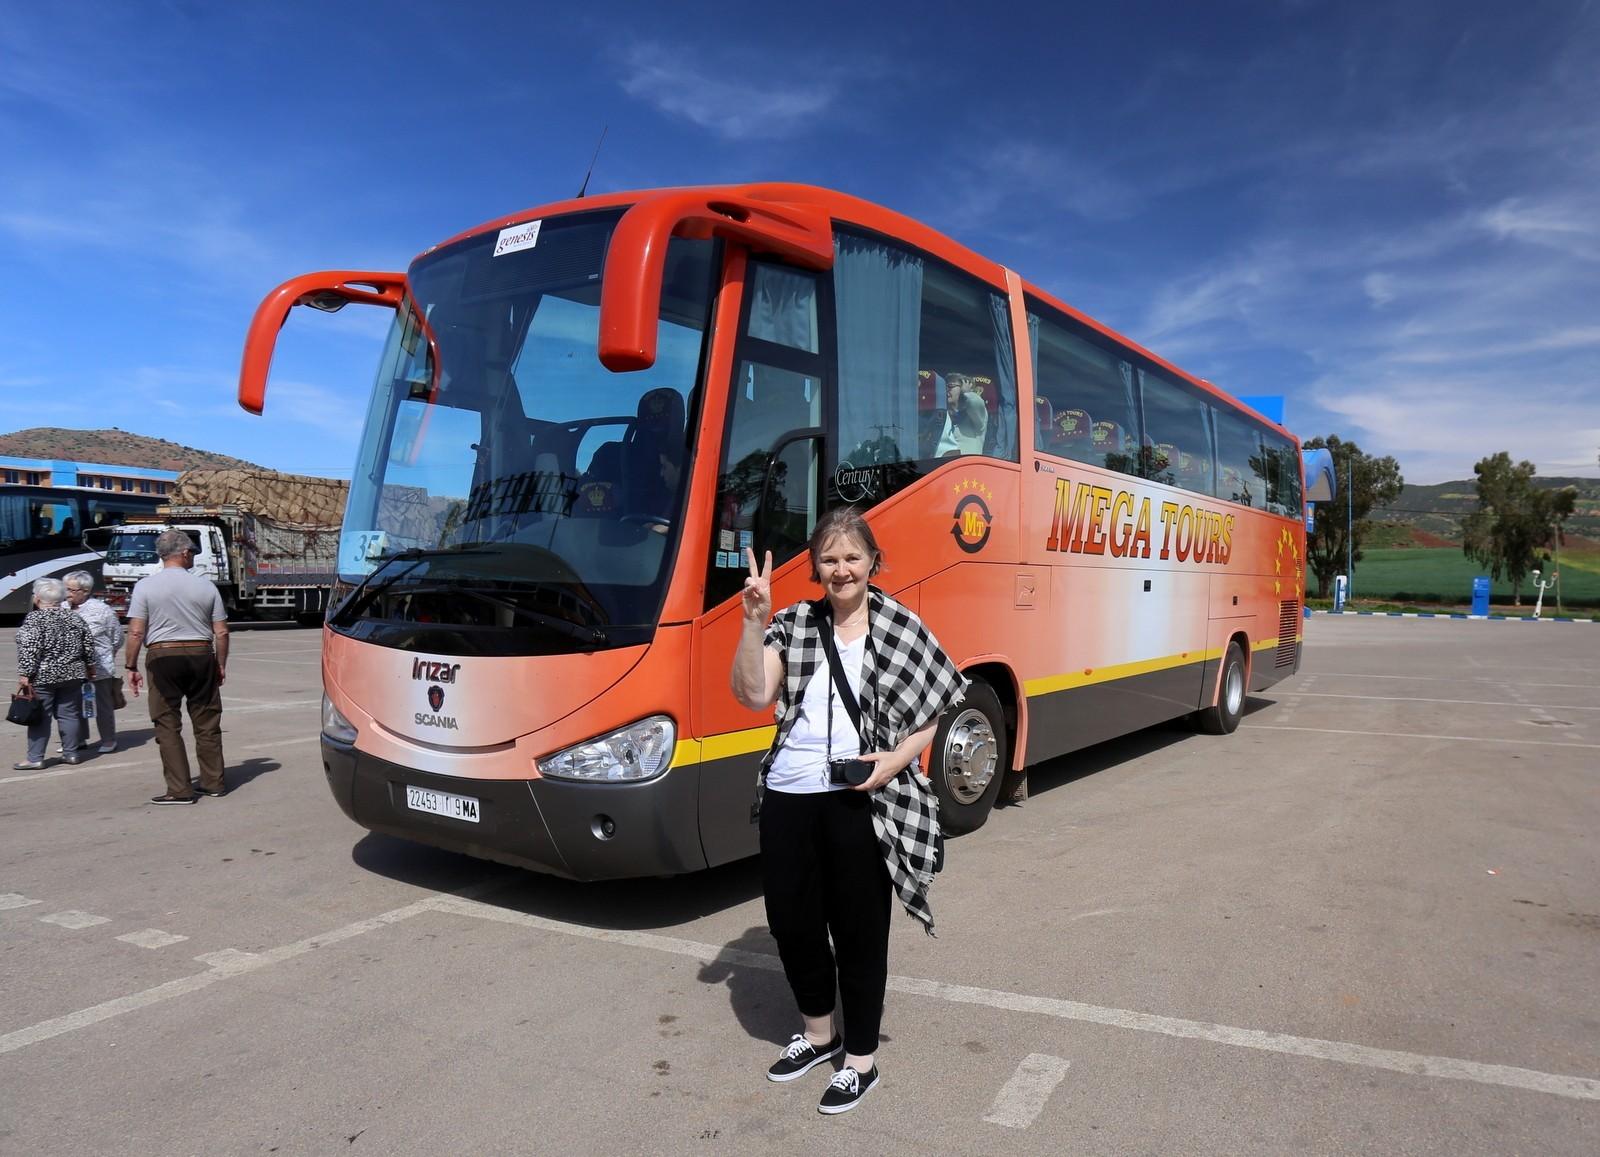 TSS-bussi Marokossa